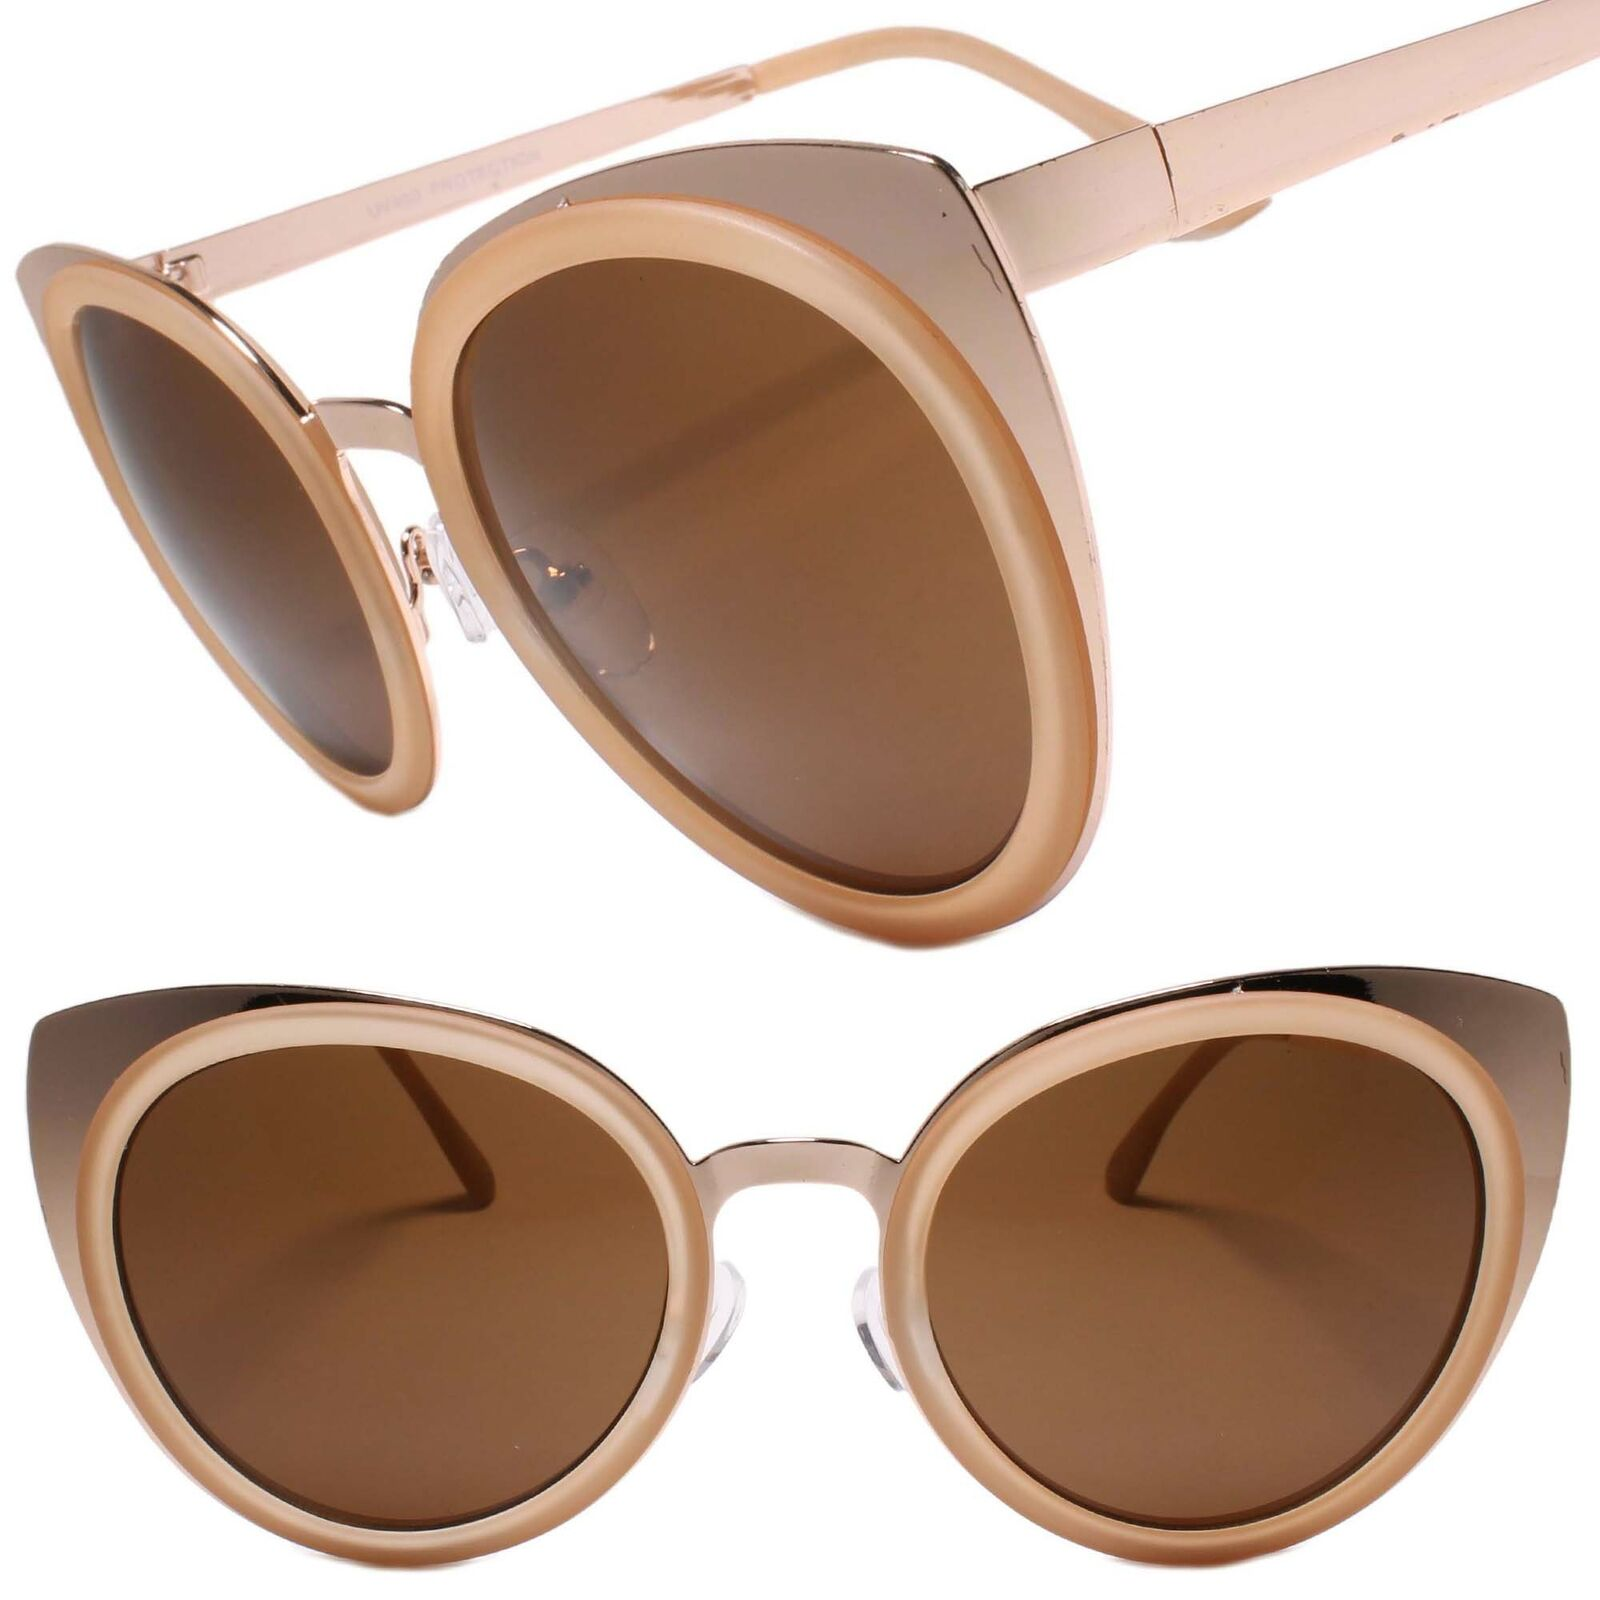 Classy Gorgeous Elegant Fancy Upscale Gold & Beige Womens Cat Eye Sunglasses